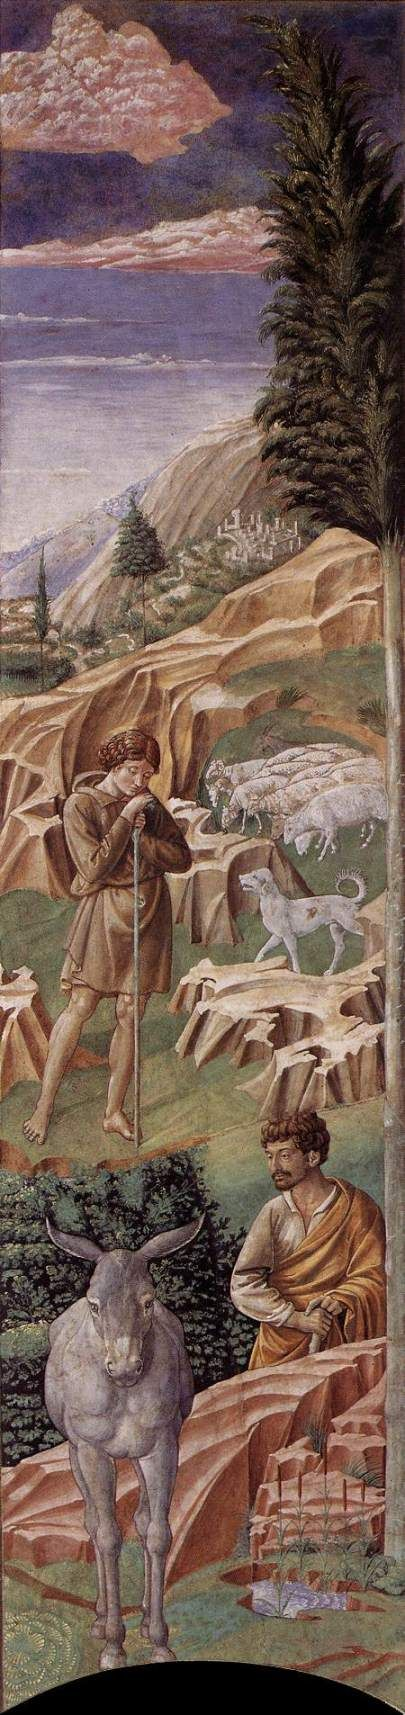 ❤ - BENOZZO GOZZOLI (1421 - 1497) - Vigil of the Shepherds. 1459-1461. Fresco. Right side of entrance to chancel.Palazzo Medici-Riccardi, Florence, Italy.